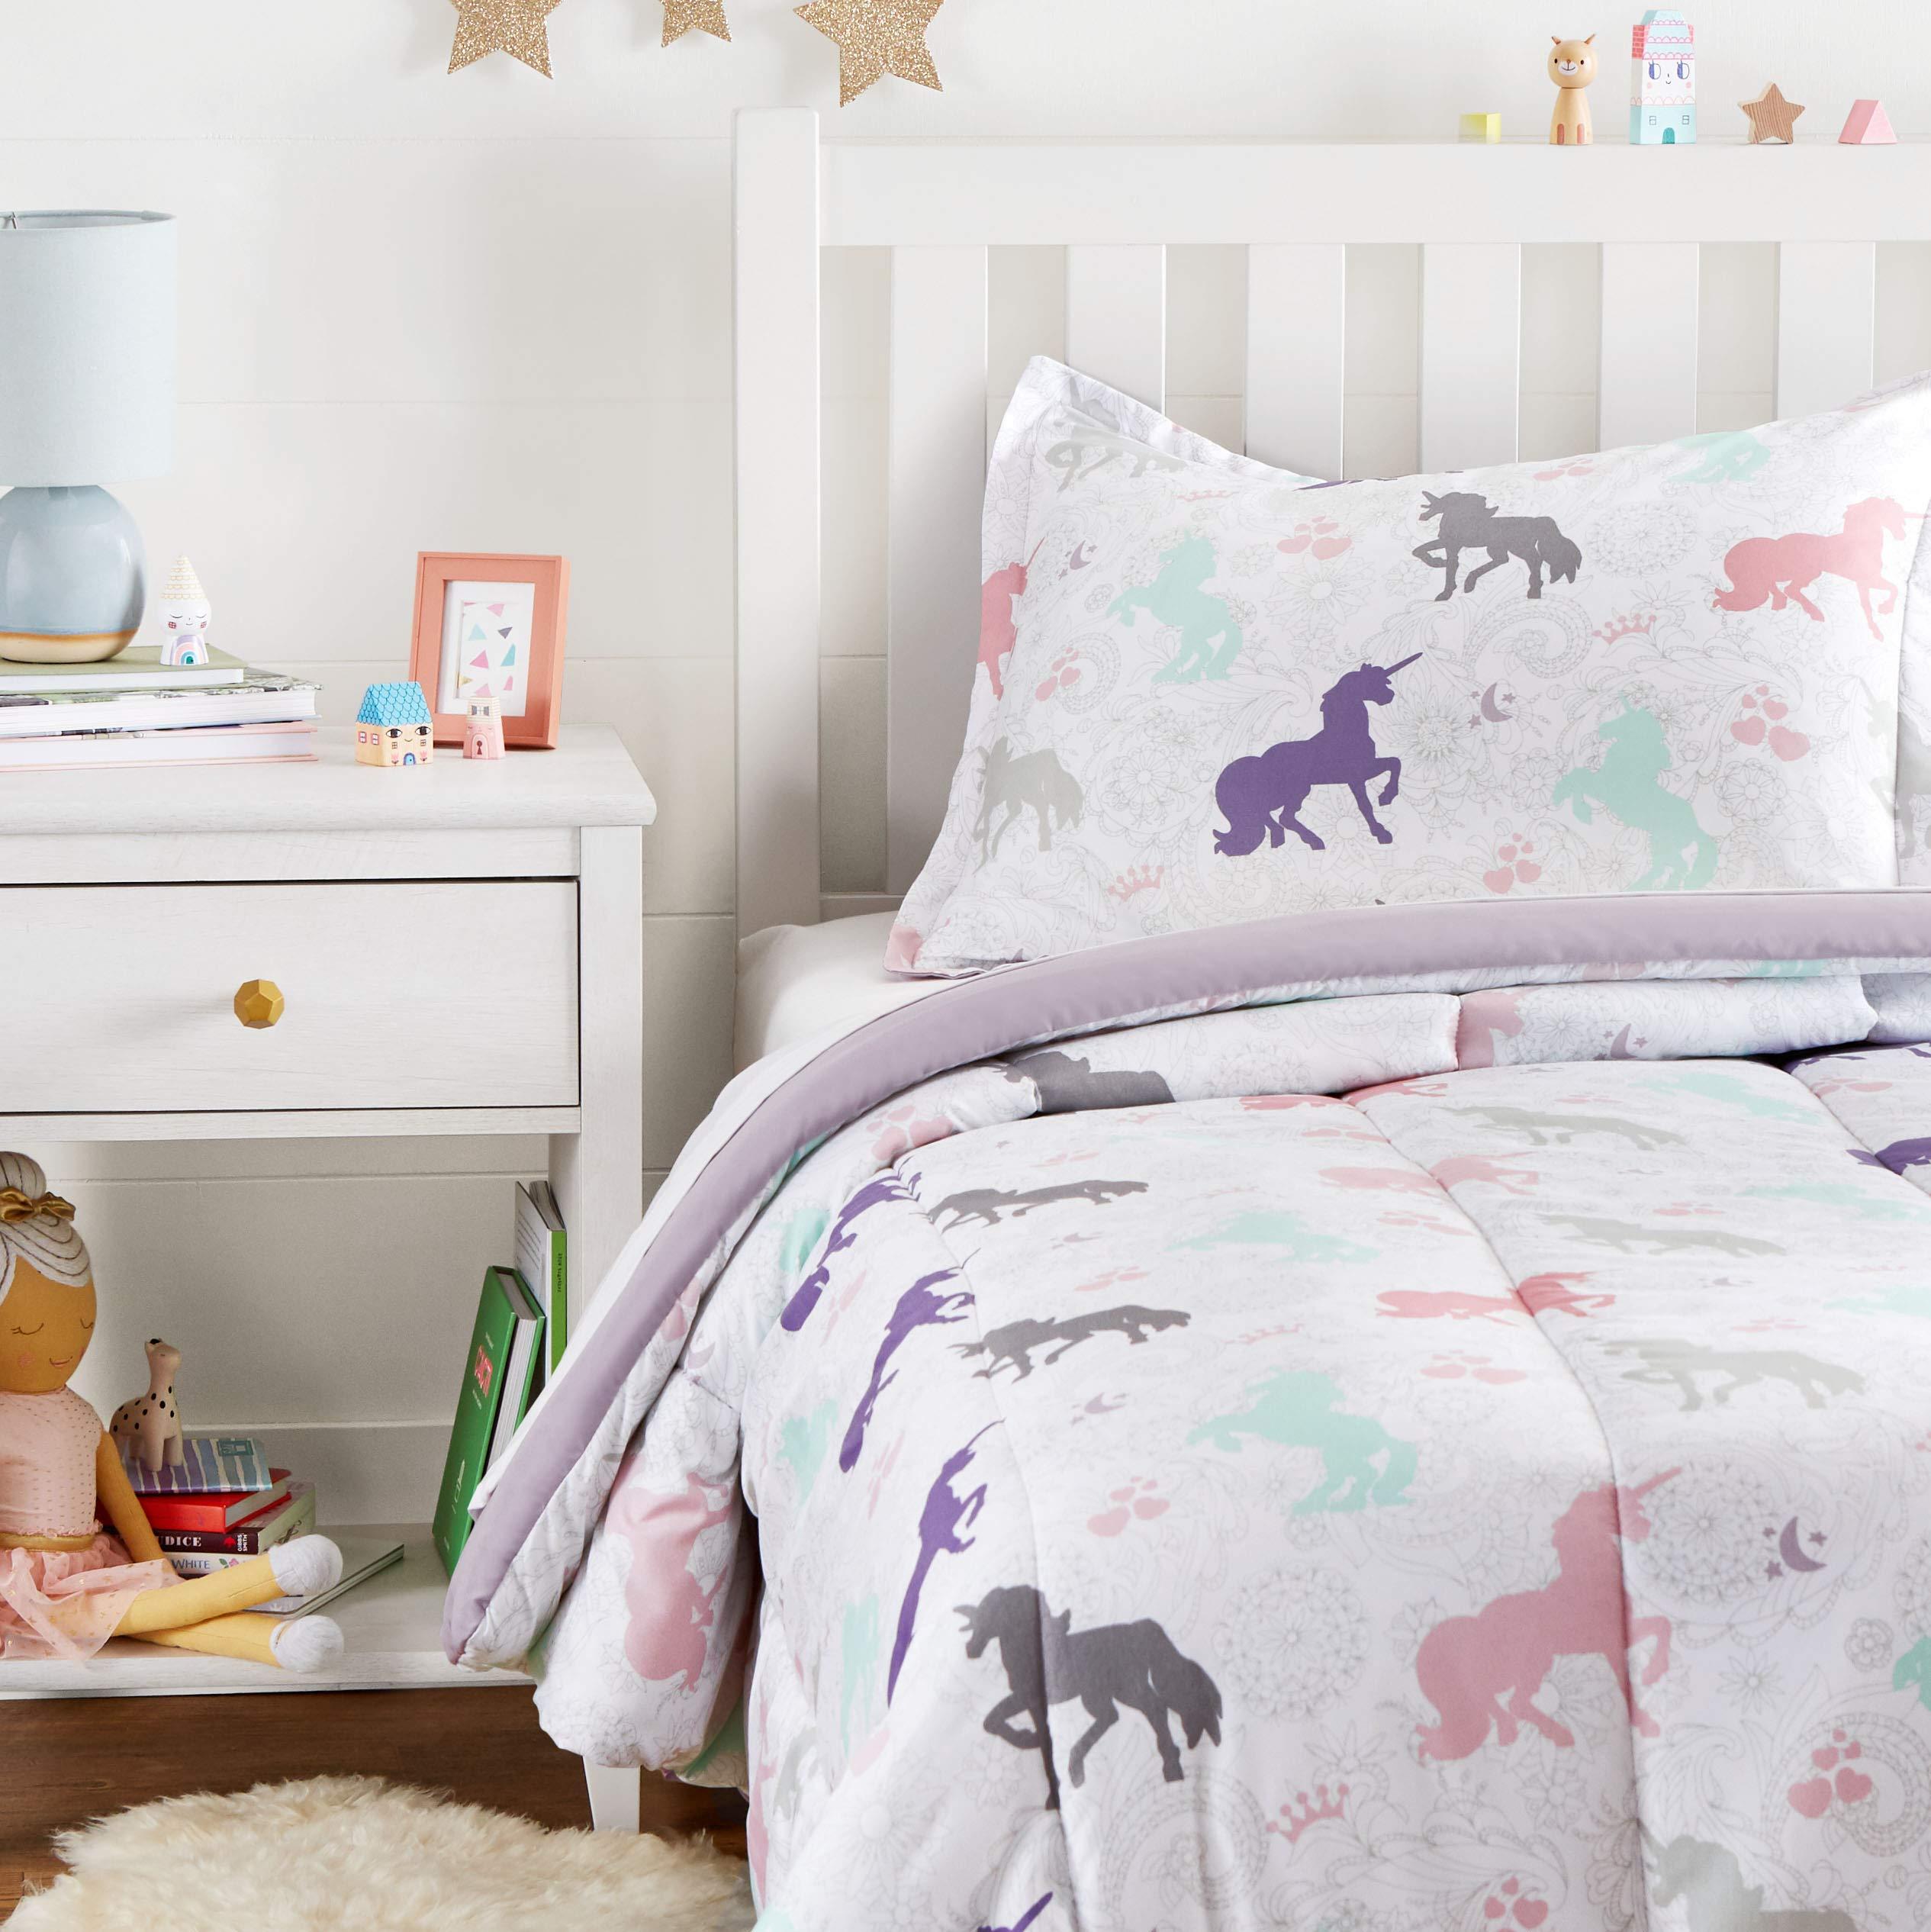 AmazonBasics Kid's Comforter Set - Soft, Easy-Wash Microfiber - Twin, Purple Unicorns by AmazonBasics (Image #3)